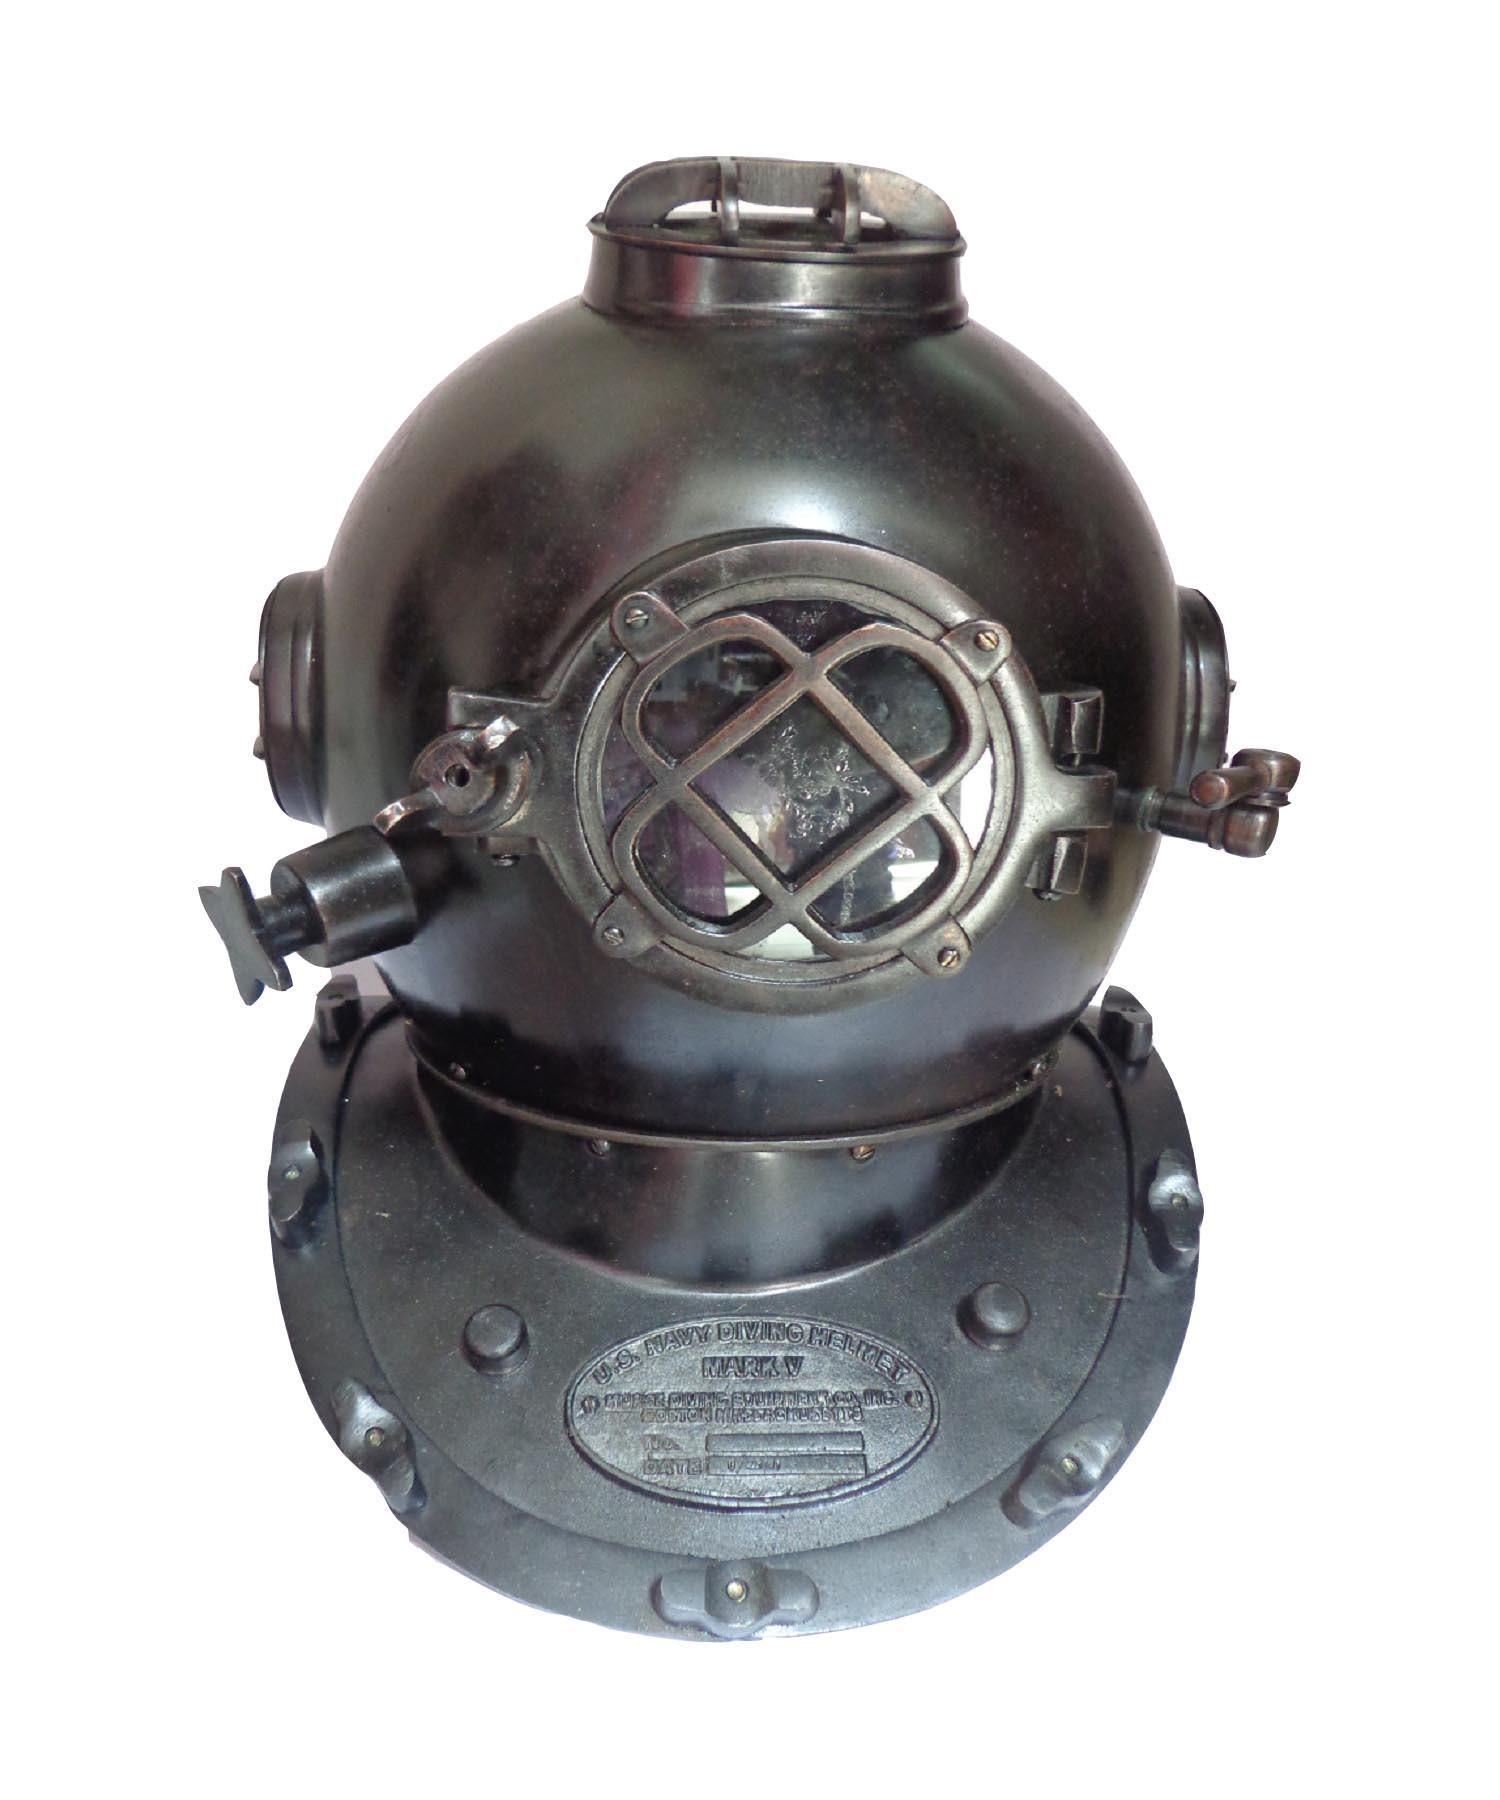 Buy Iron Black Navy Diving Helmets Marine Online At